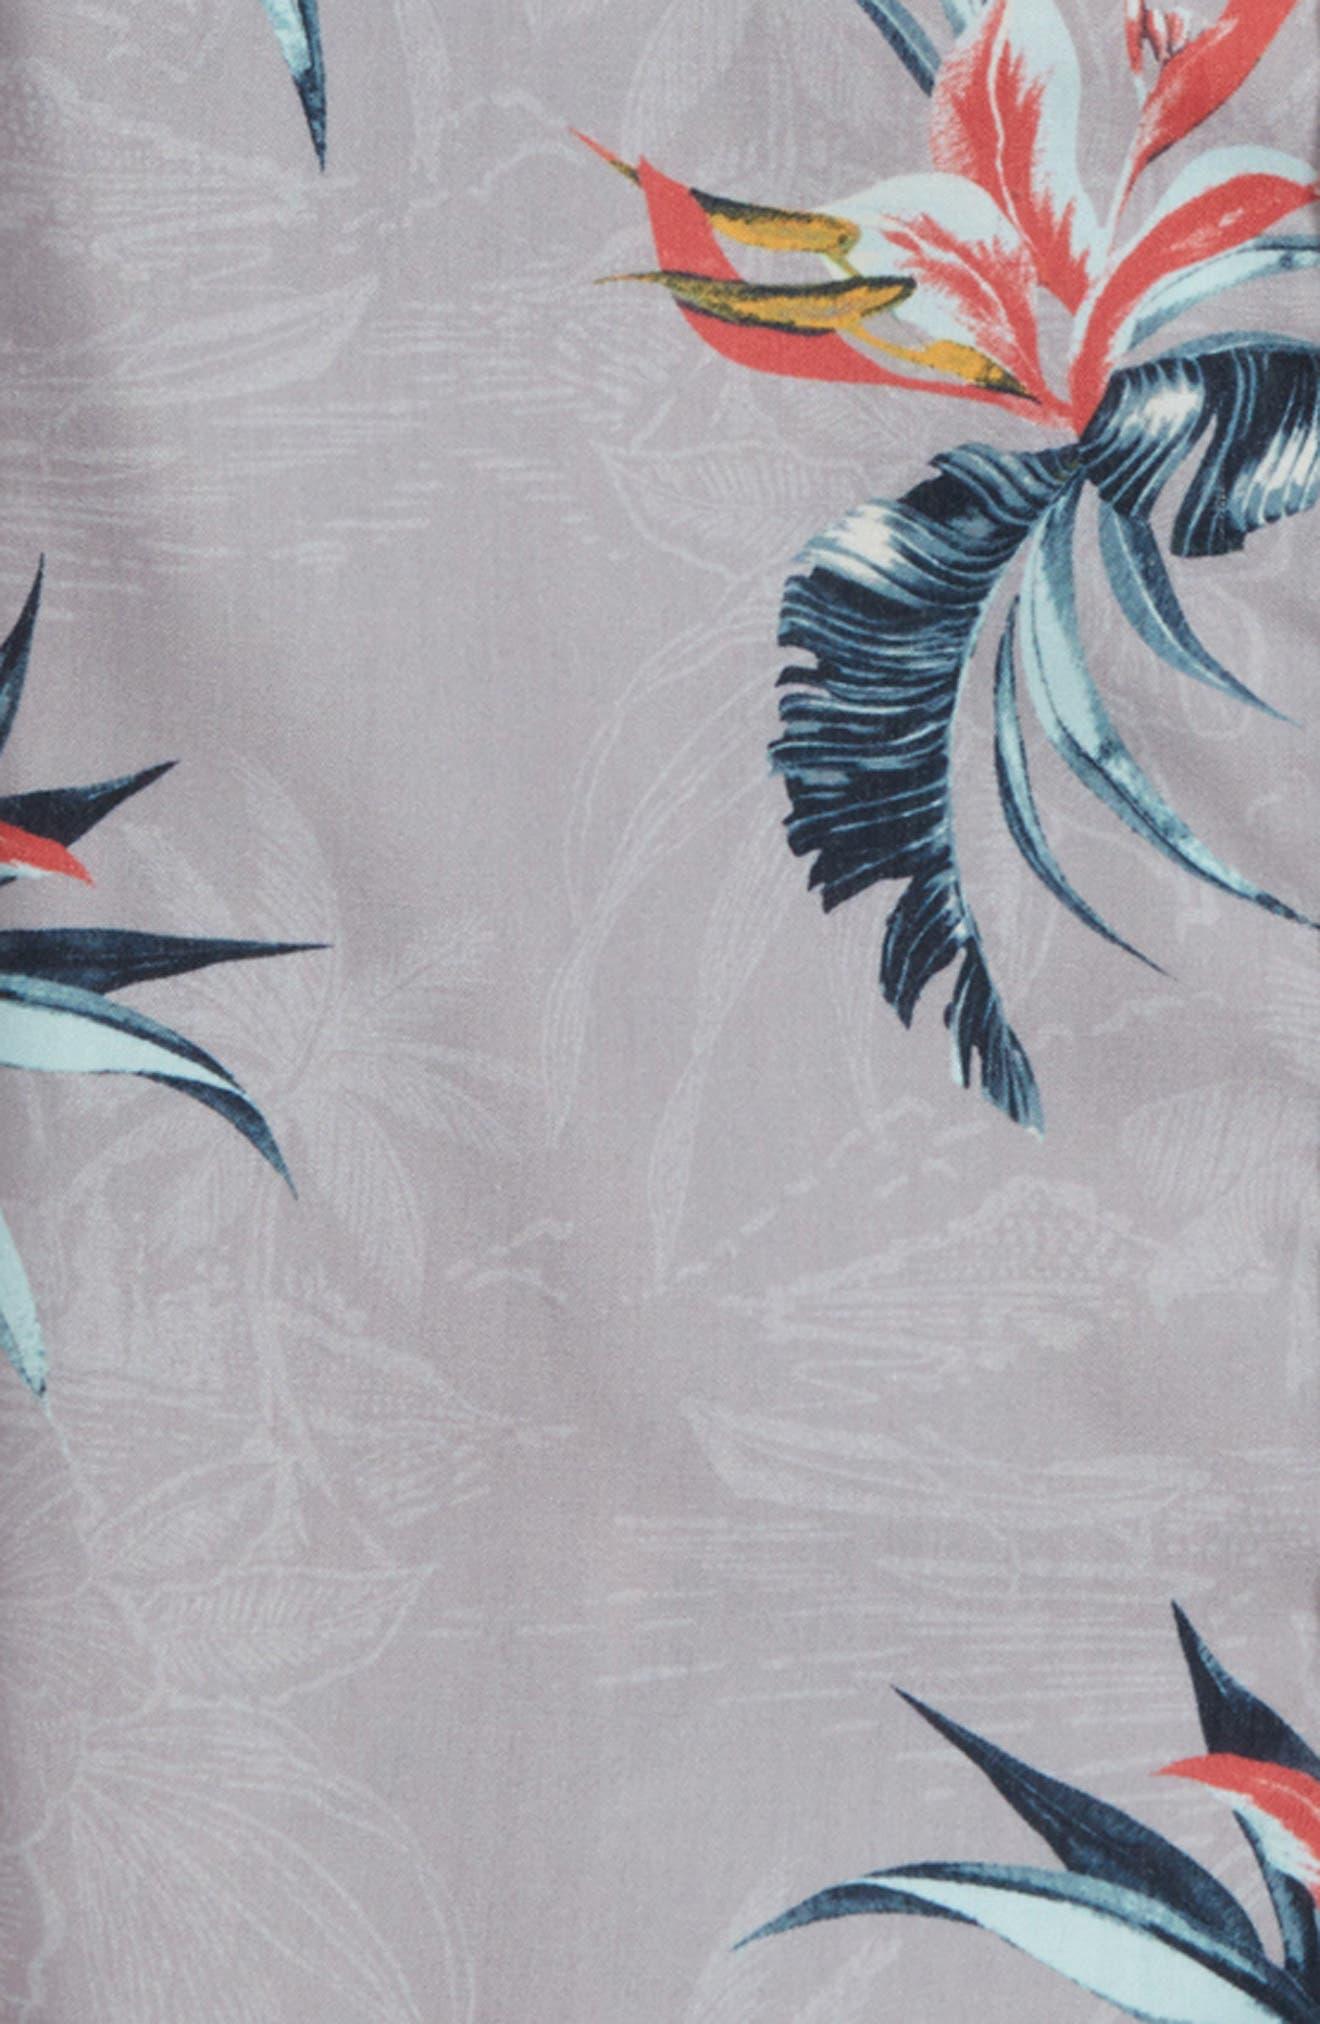 Islander Floral Print Woven Shirt,                             Alternate thumbnail 3, color,